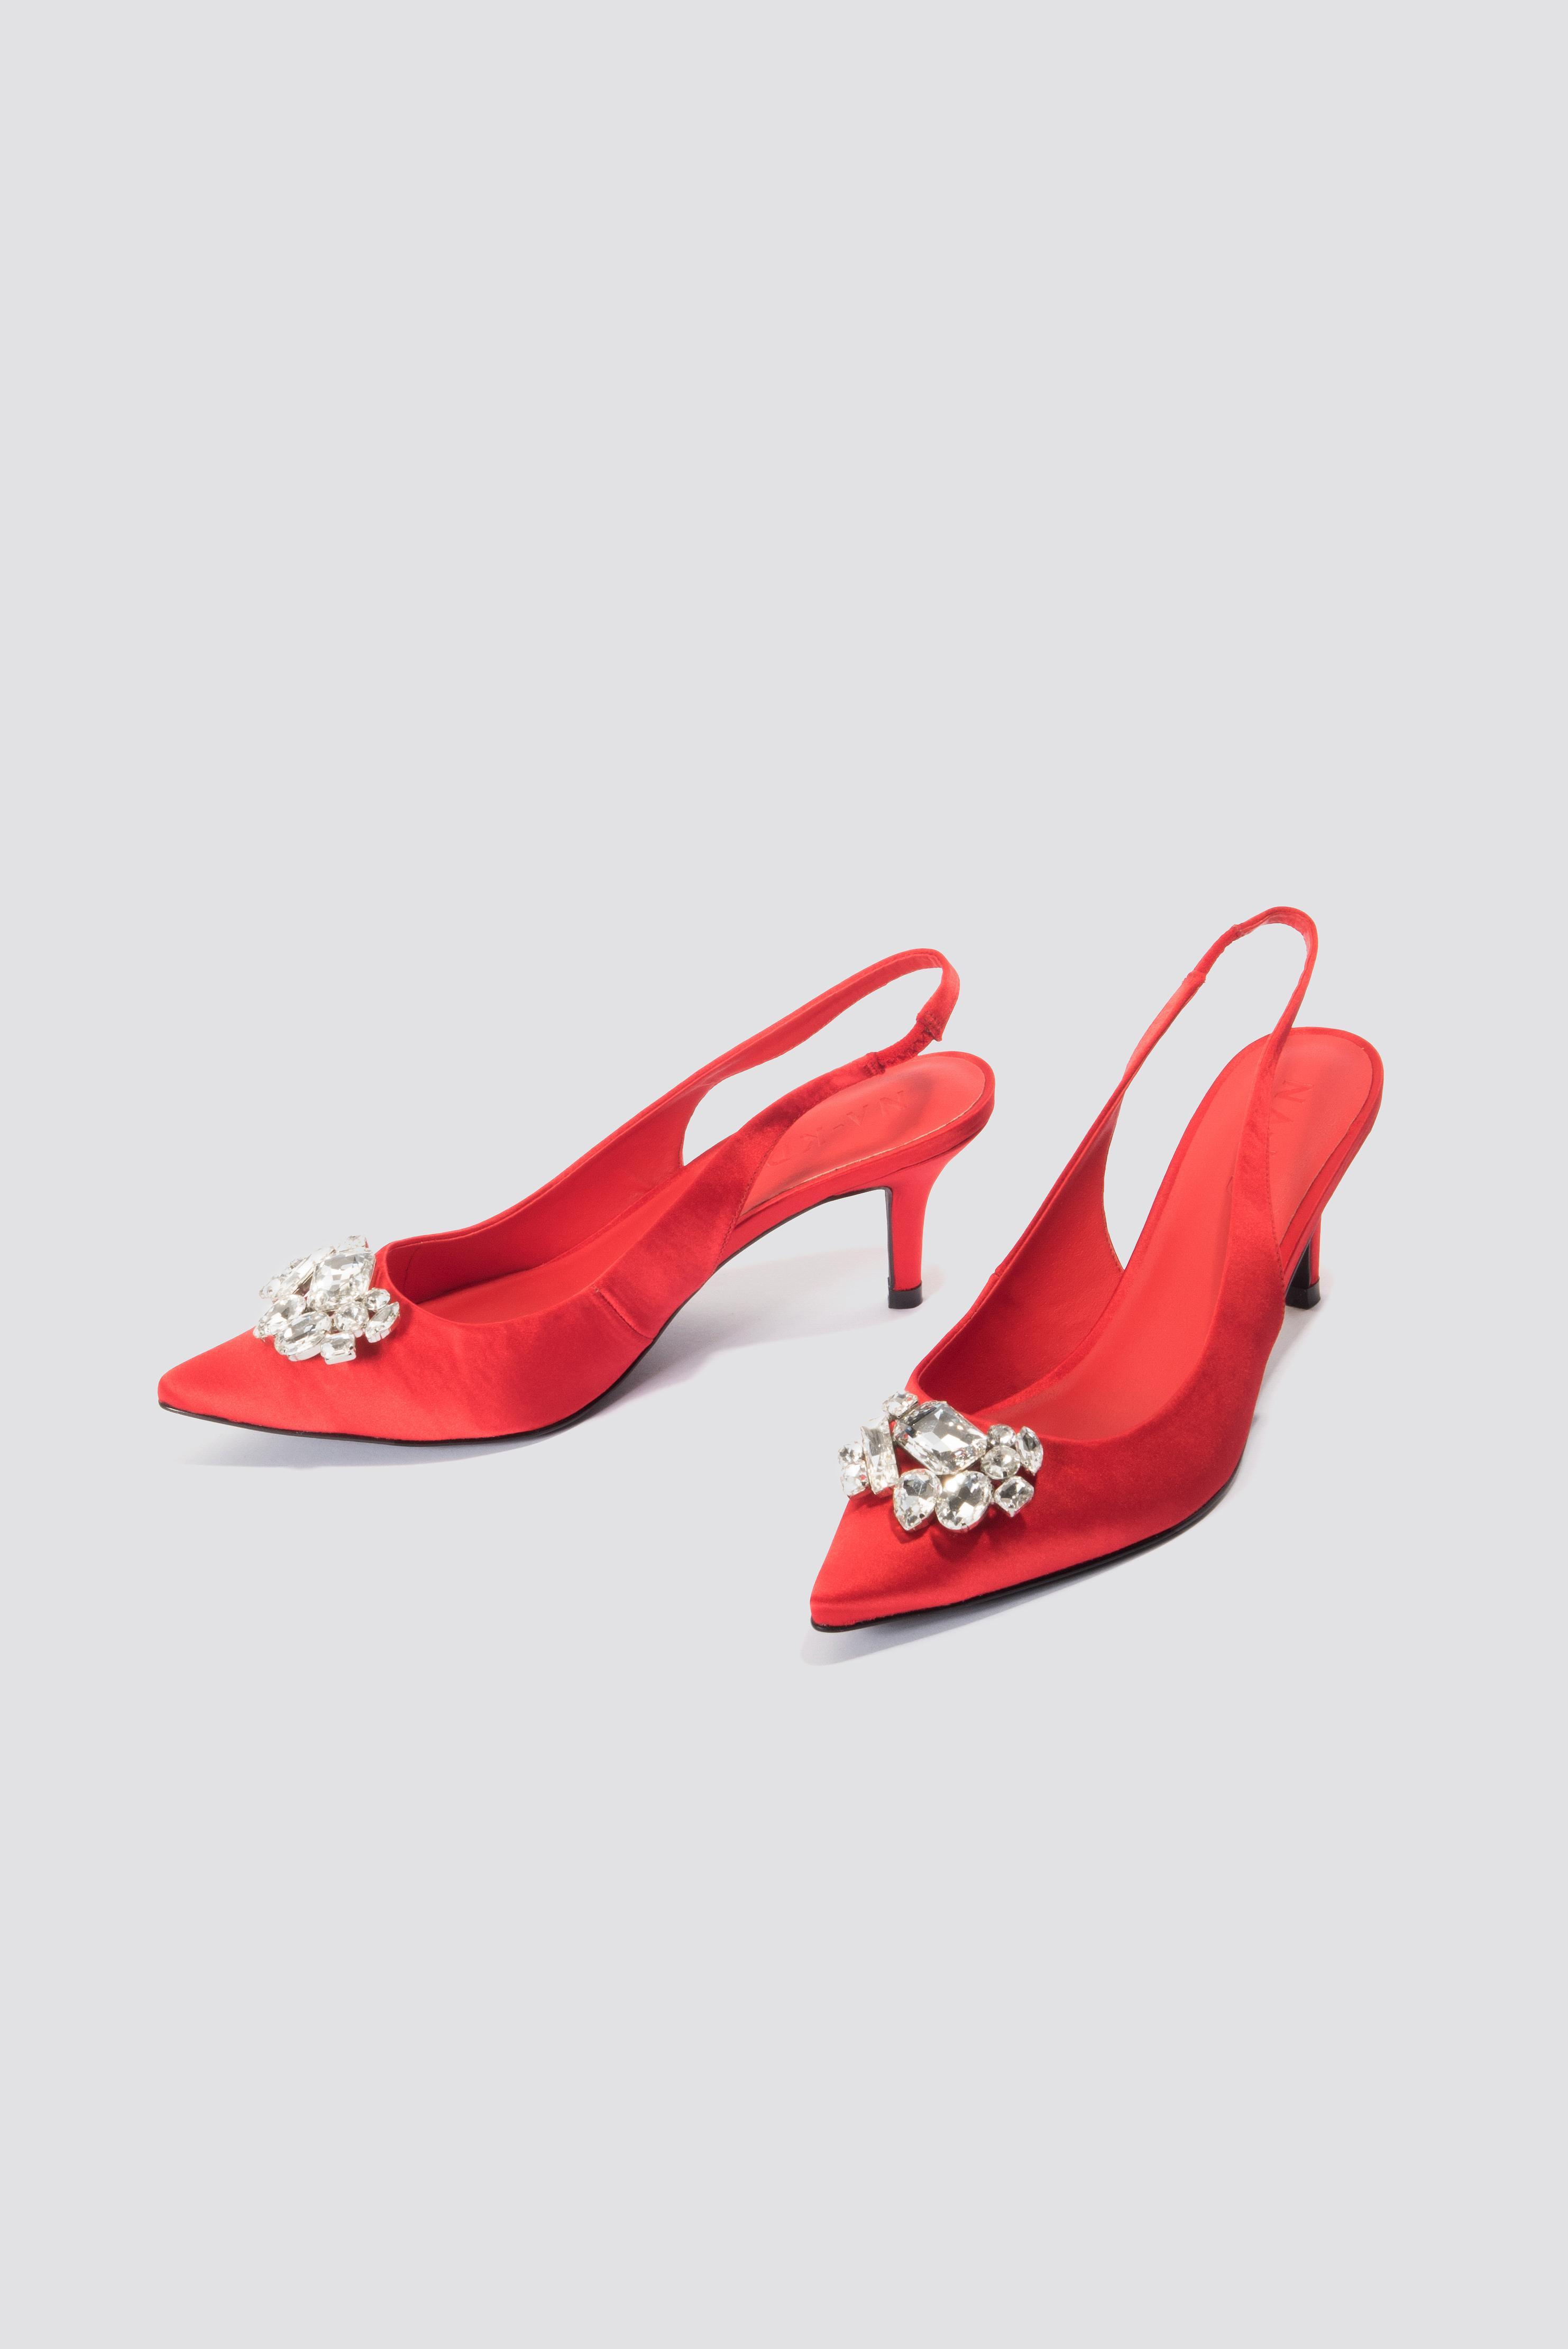 4f17d61b24 Lyst - NA-KD Light Embellished Kitten Heel Pumps Red in Red